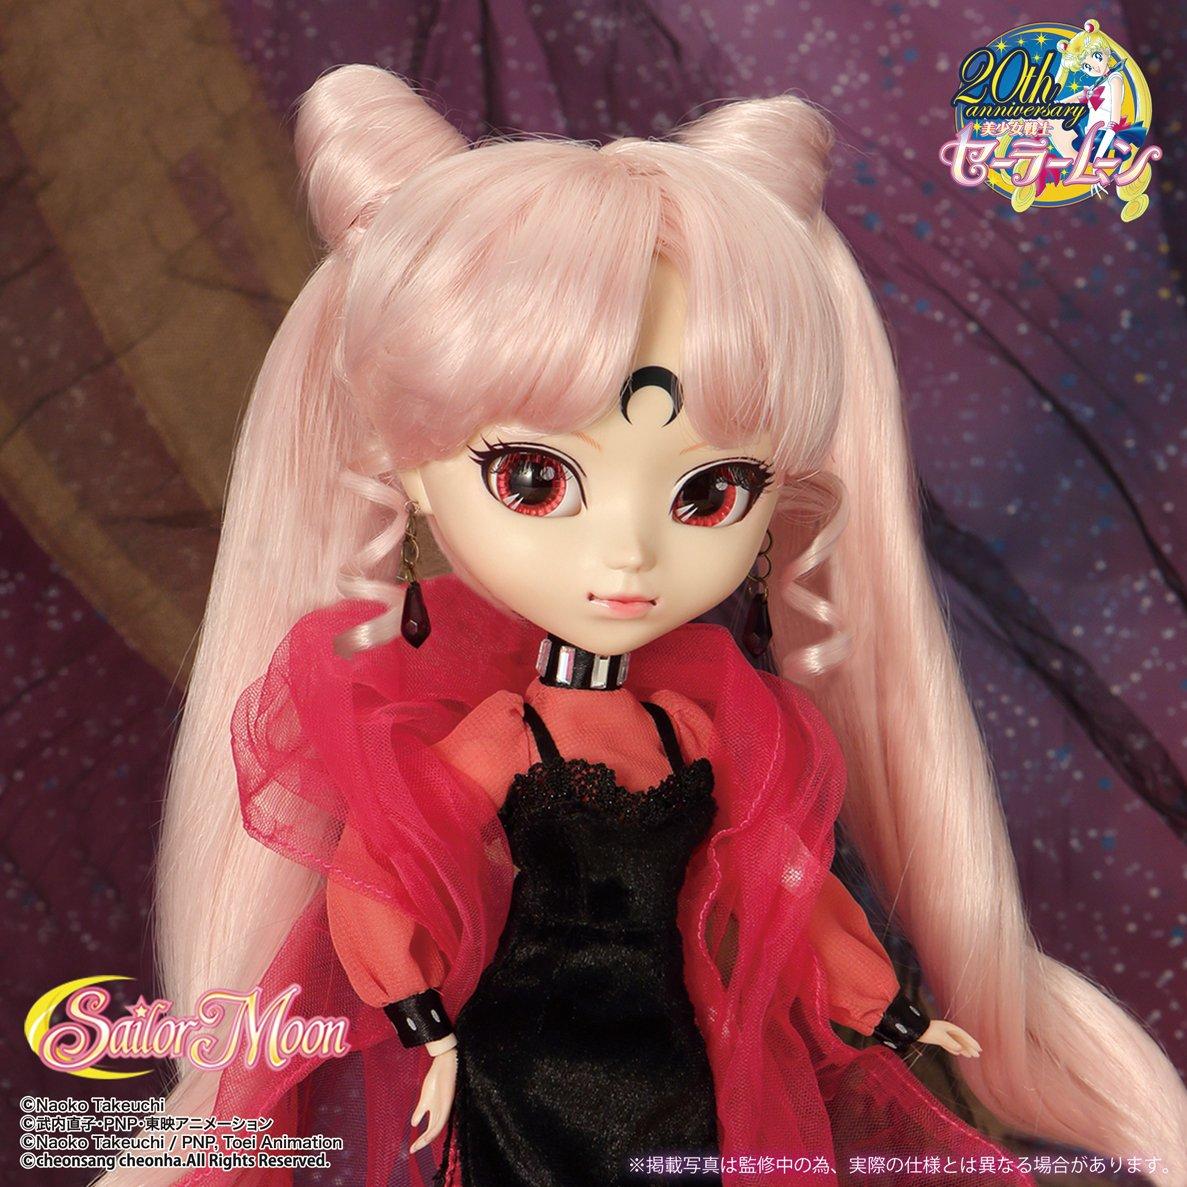 Pullip Sailor Moon Black Lady P-154 by Pullip (Image #6)